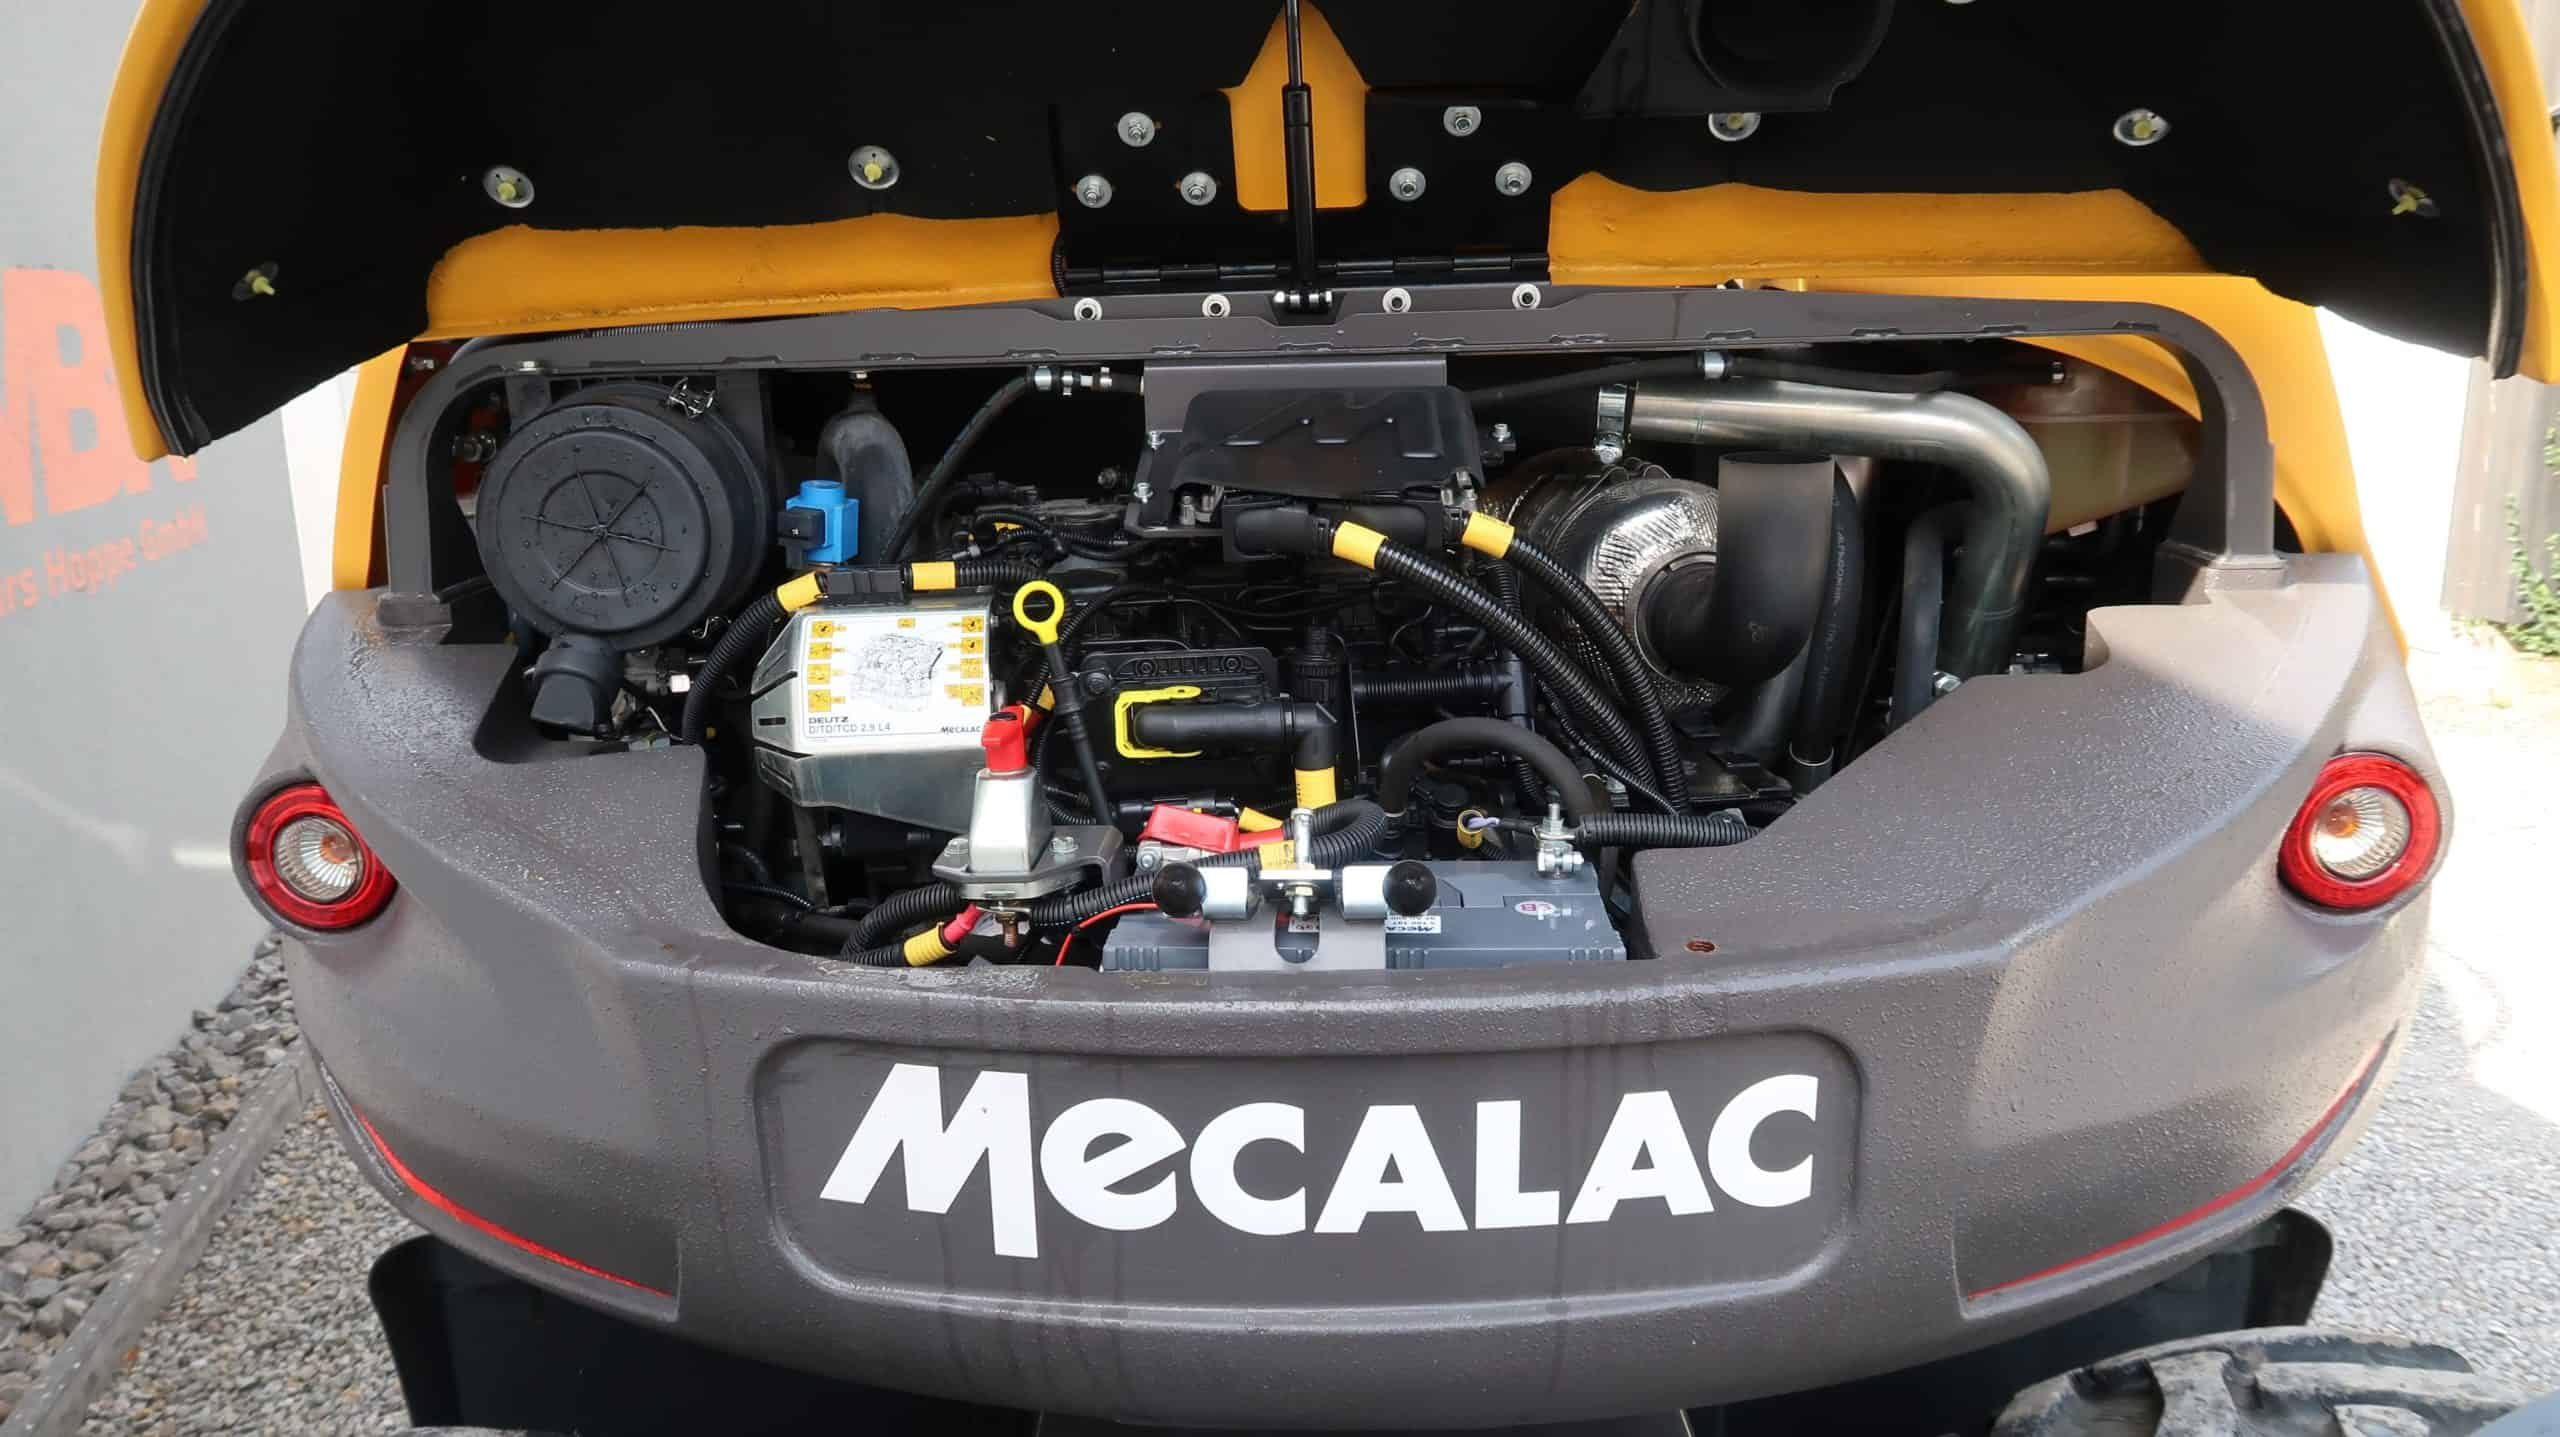 Mecalac-7 MWR-Mobilbagger-Motor